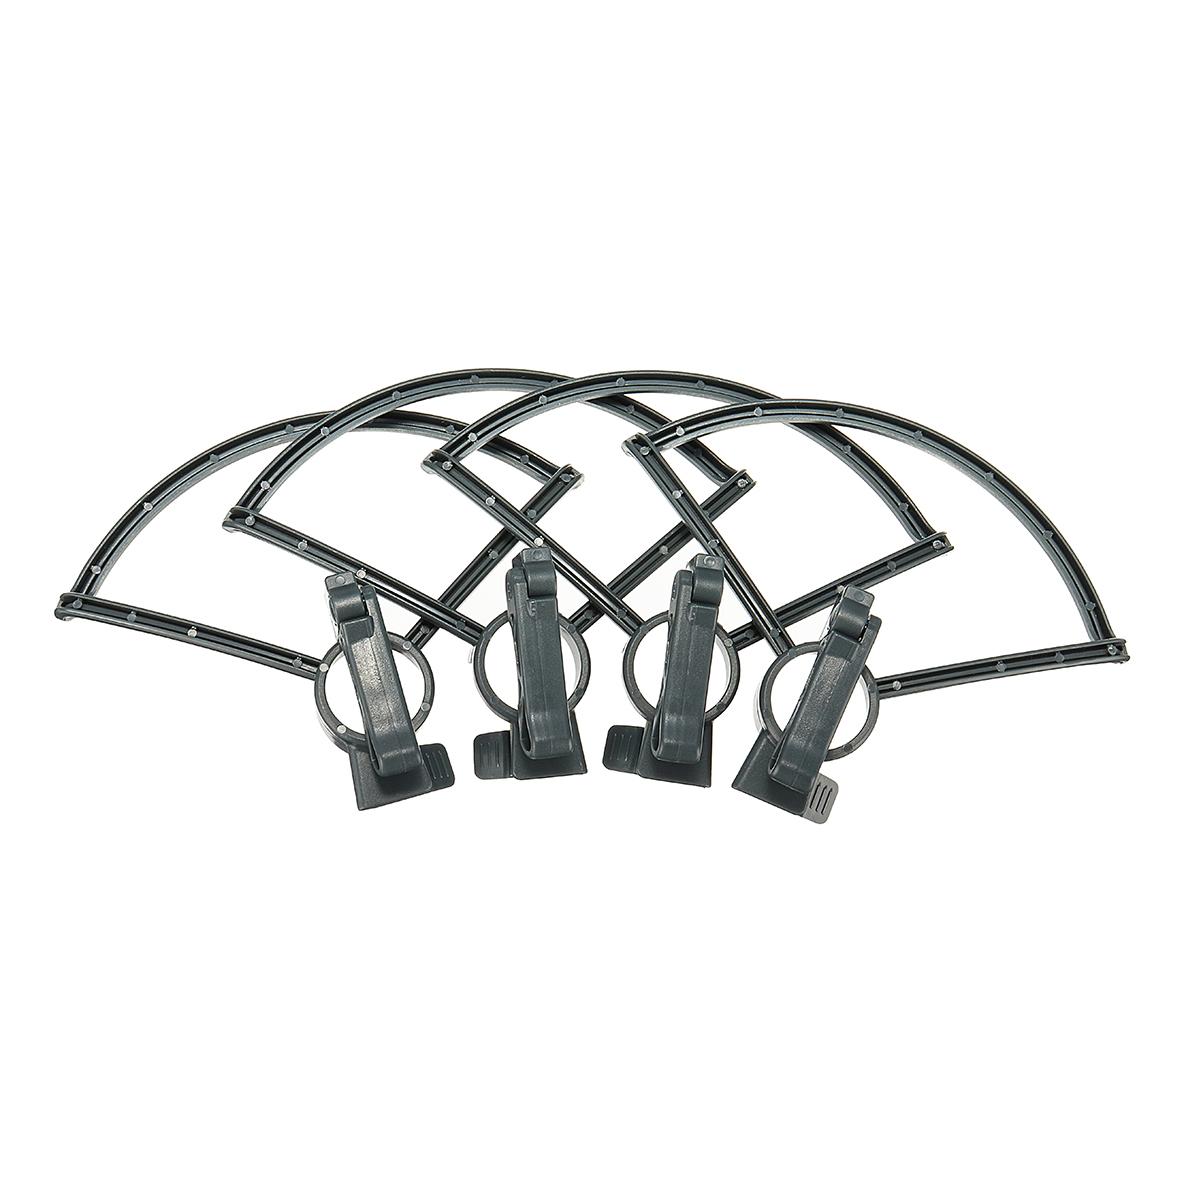 8 Pack Bundle Combo Propeller Guard Landing Gear Hood For Dji Spark Dronerts Store